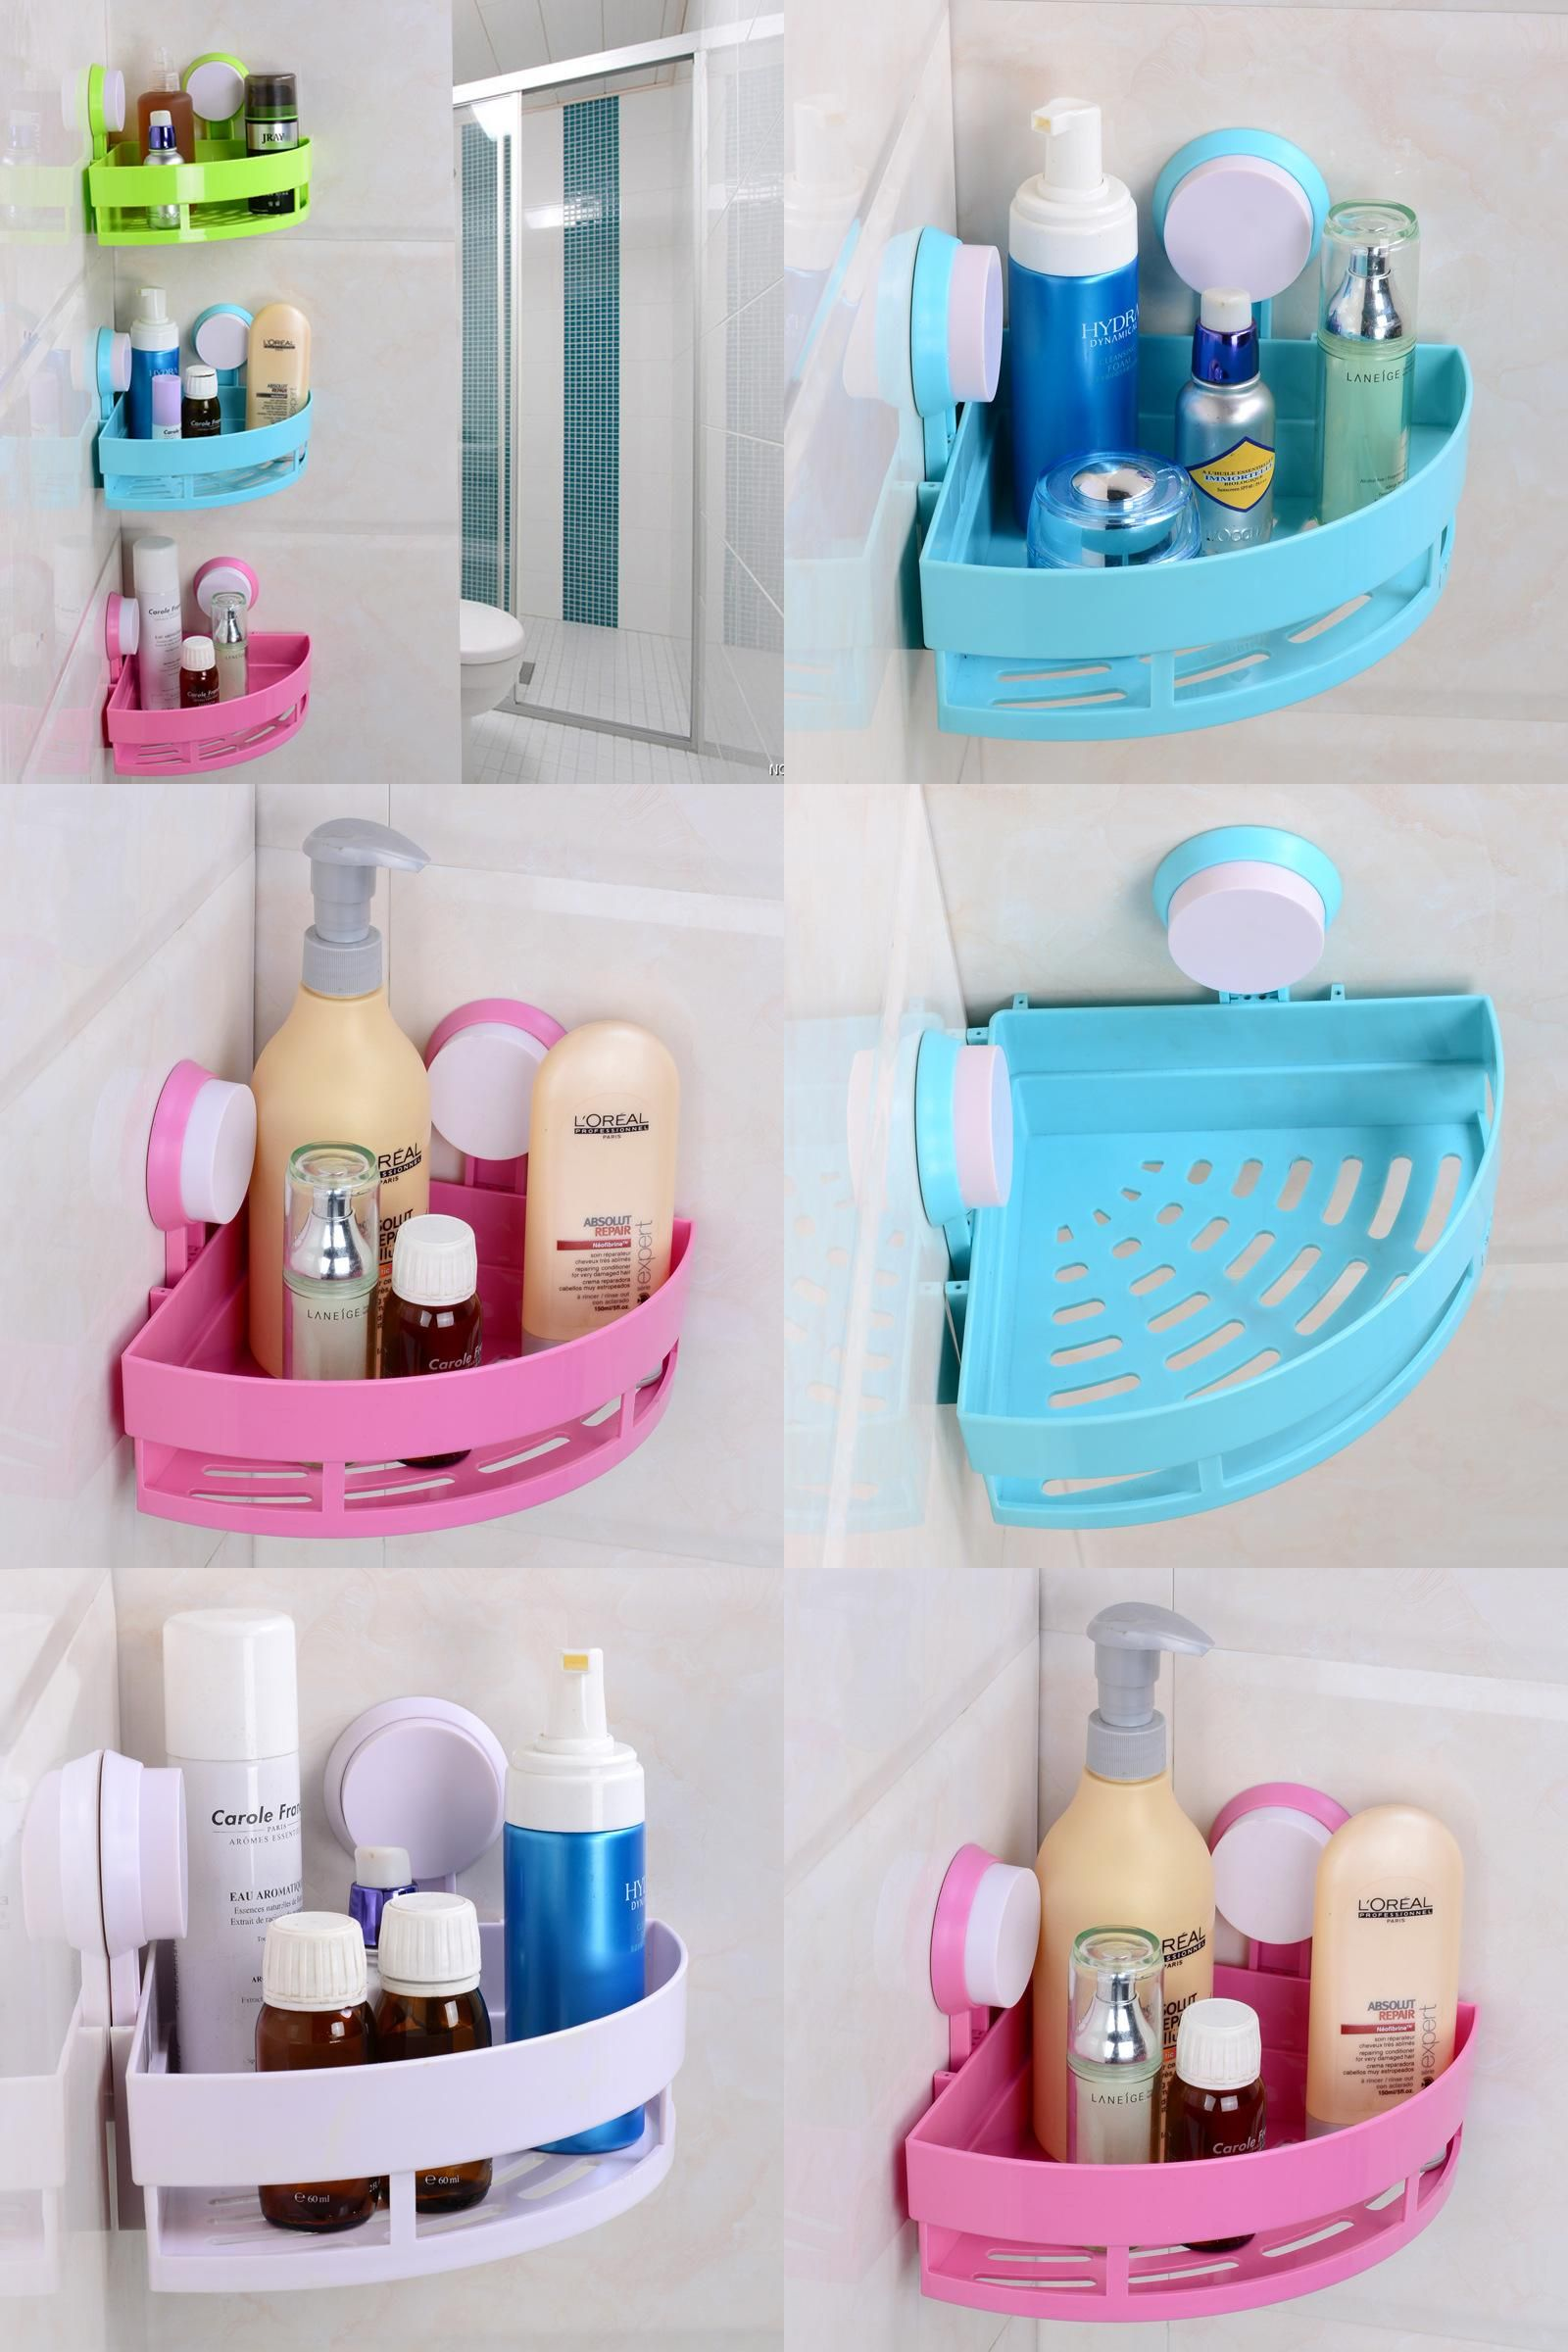 Visit To Buy Icd60009 Fashion Space Plastic Bathroom Shelf Abs Corner Shelf Storage Bath Basket Bat Cheap Bathroom Accessories Storage Shelves Corner Shelves [ jpg ]